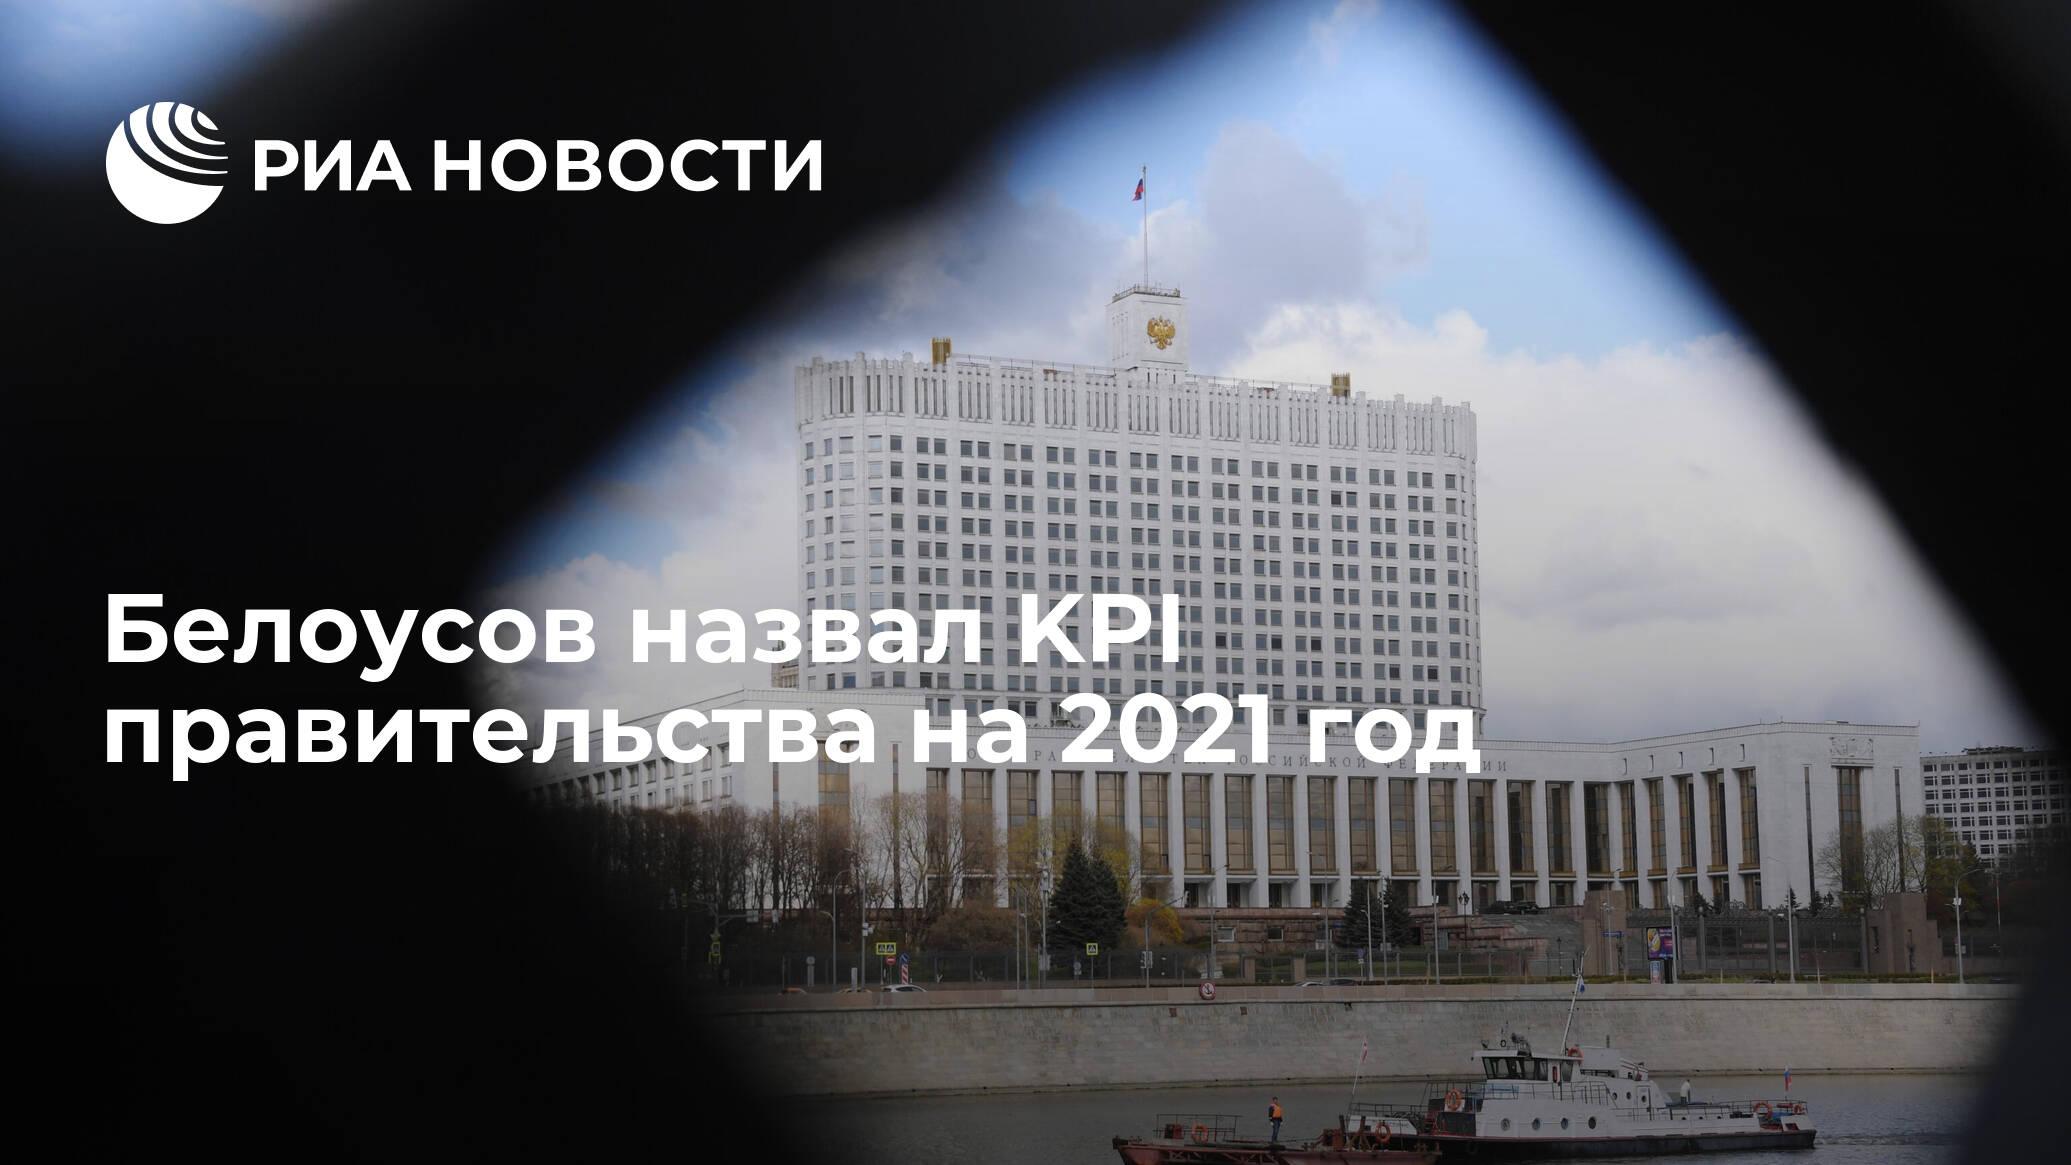 Белоусов назвал KPI правительства на 2021 год